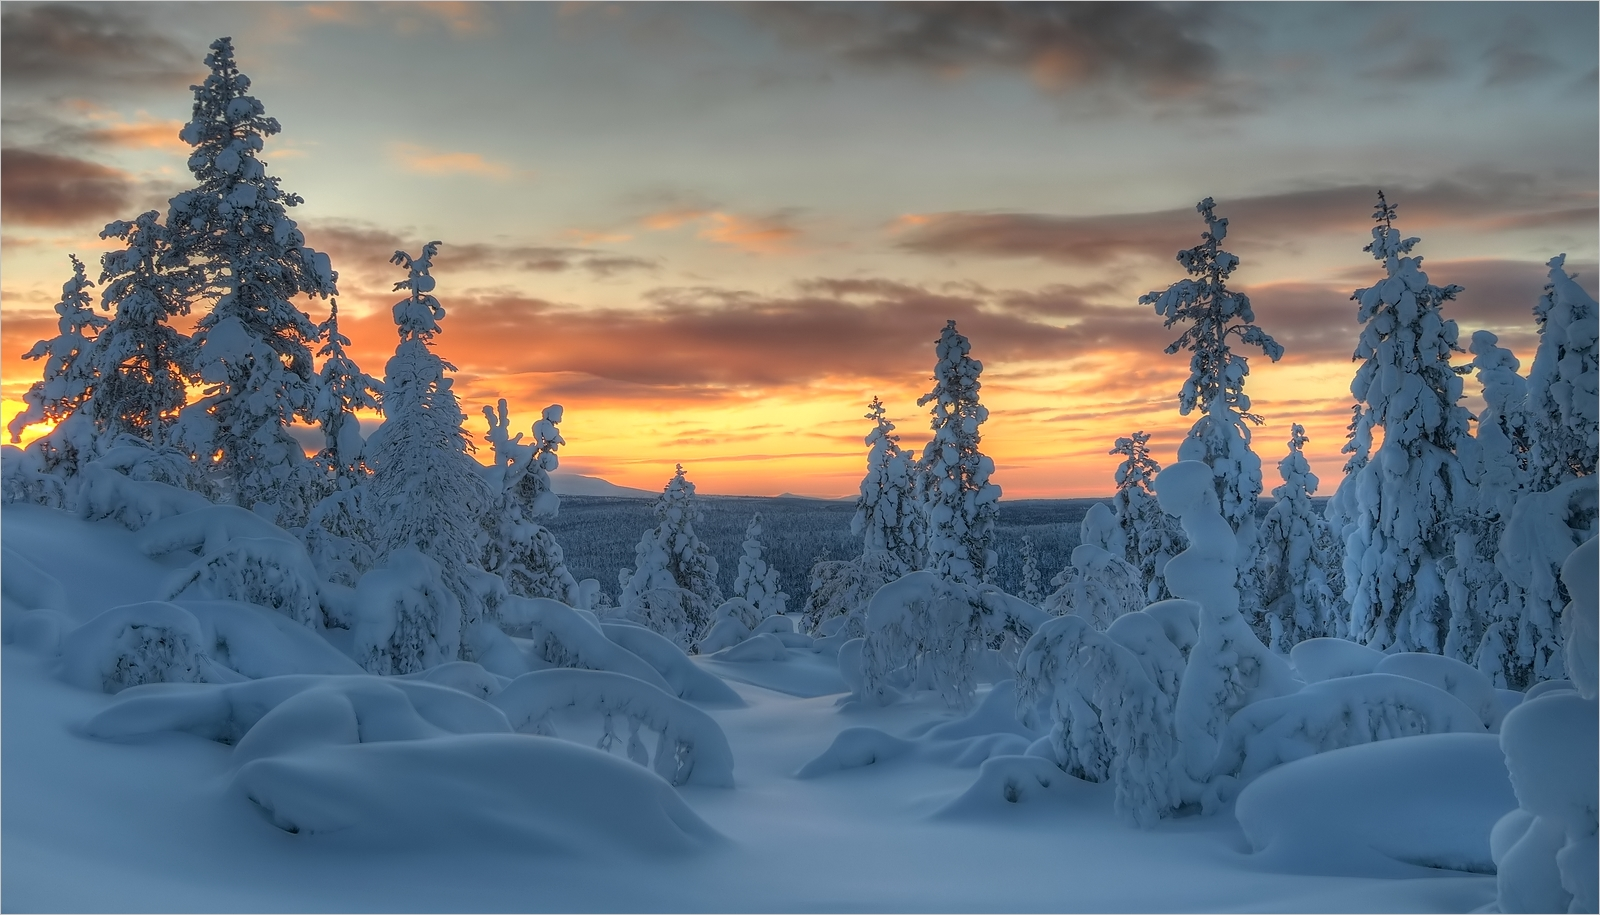 Winter in Enontekiö